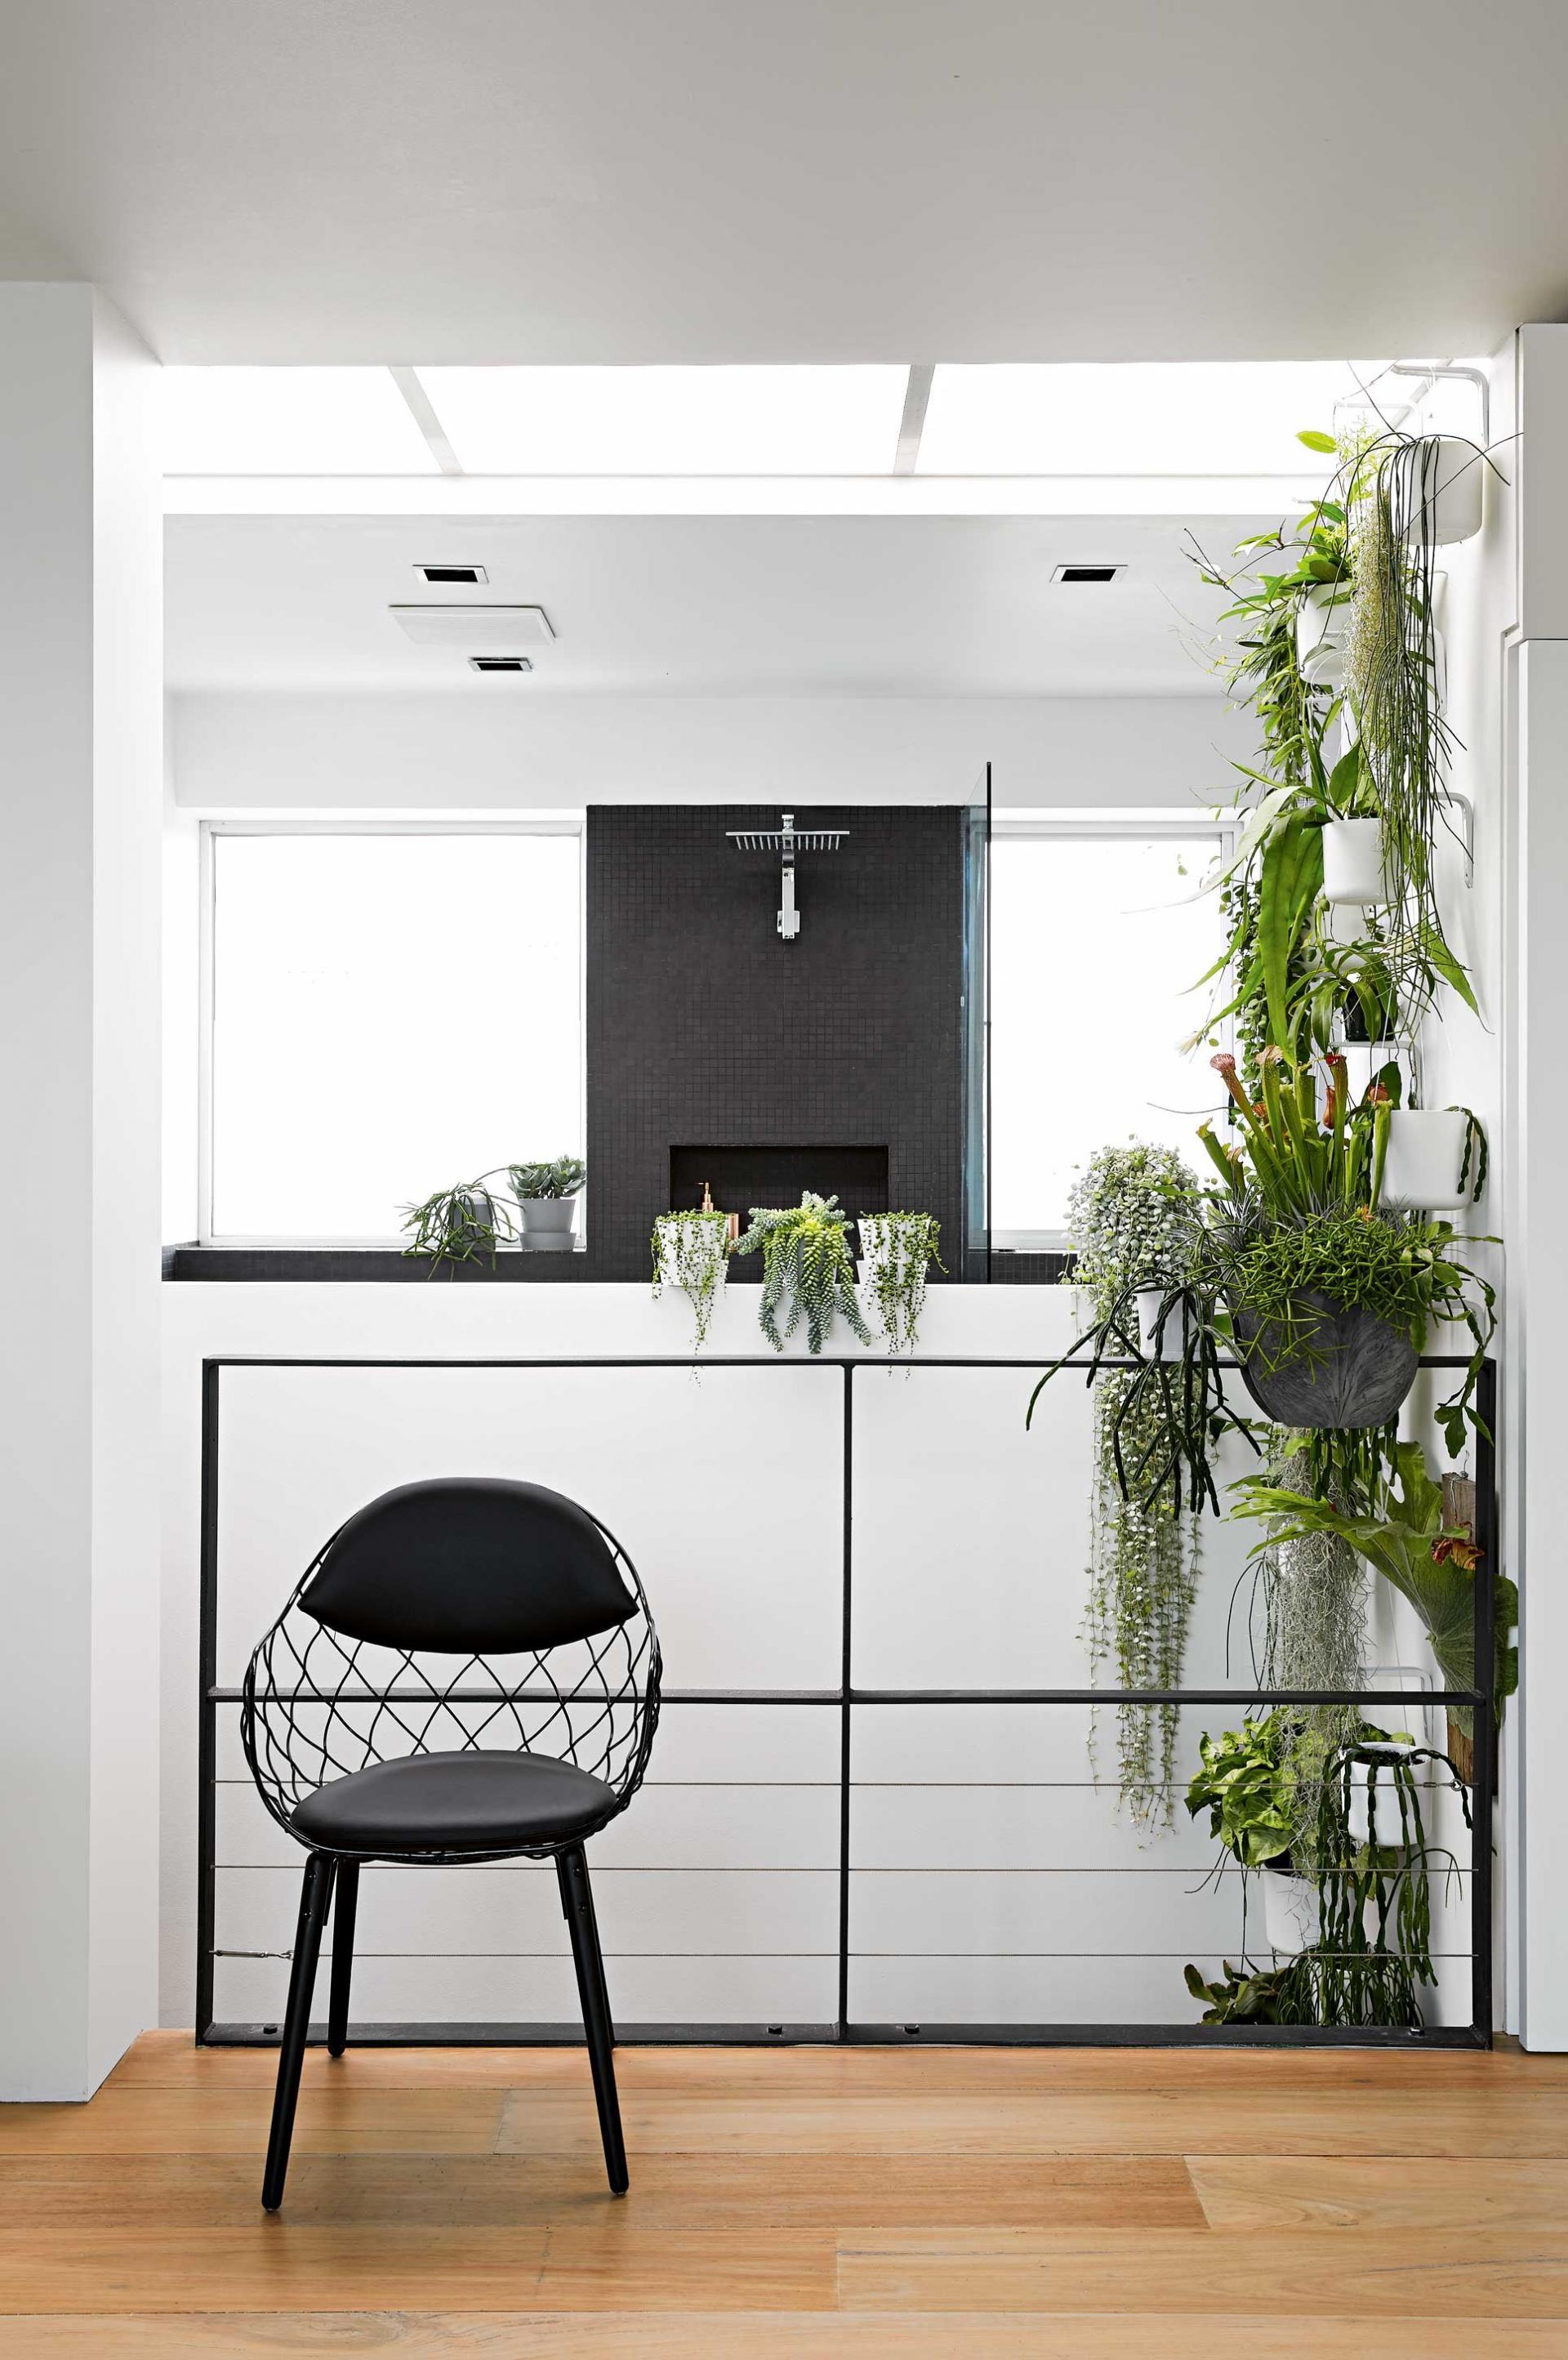 stair-landing-green-wall-sept15 | all over | Pinterest | Stair ...